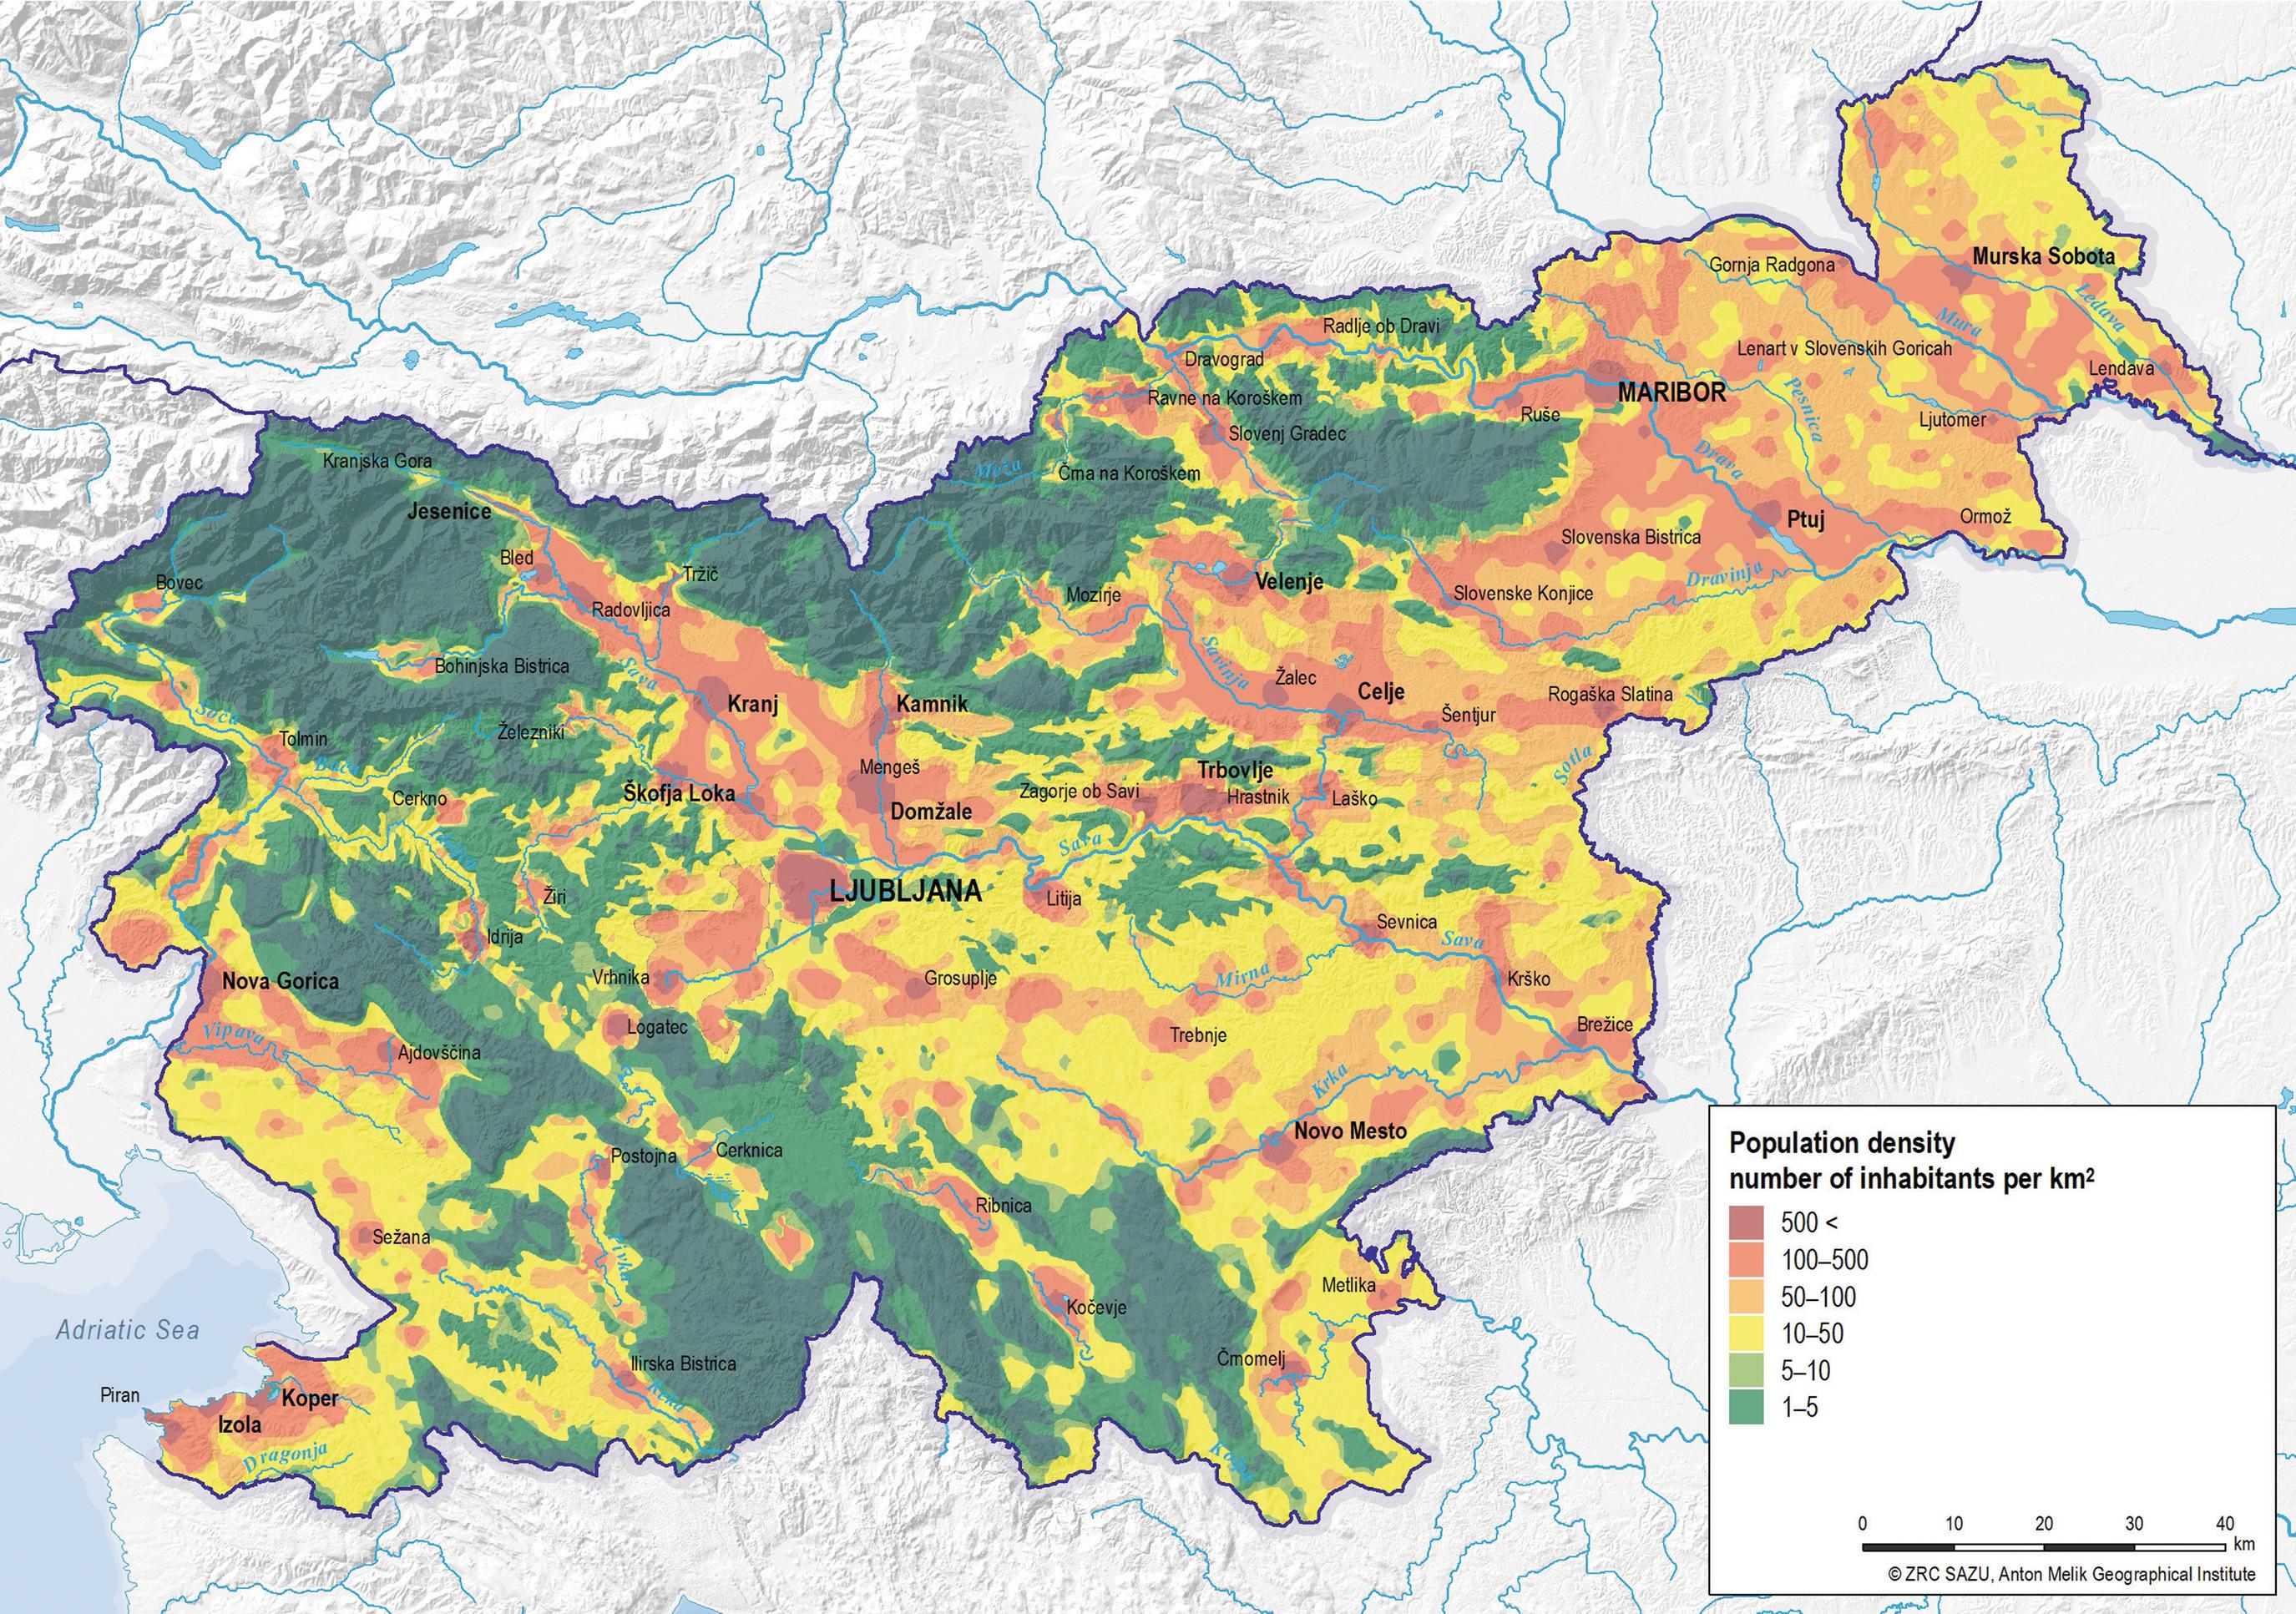 Slovenia's Population | SpringerLink